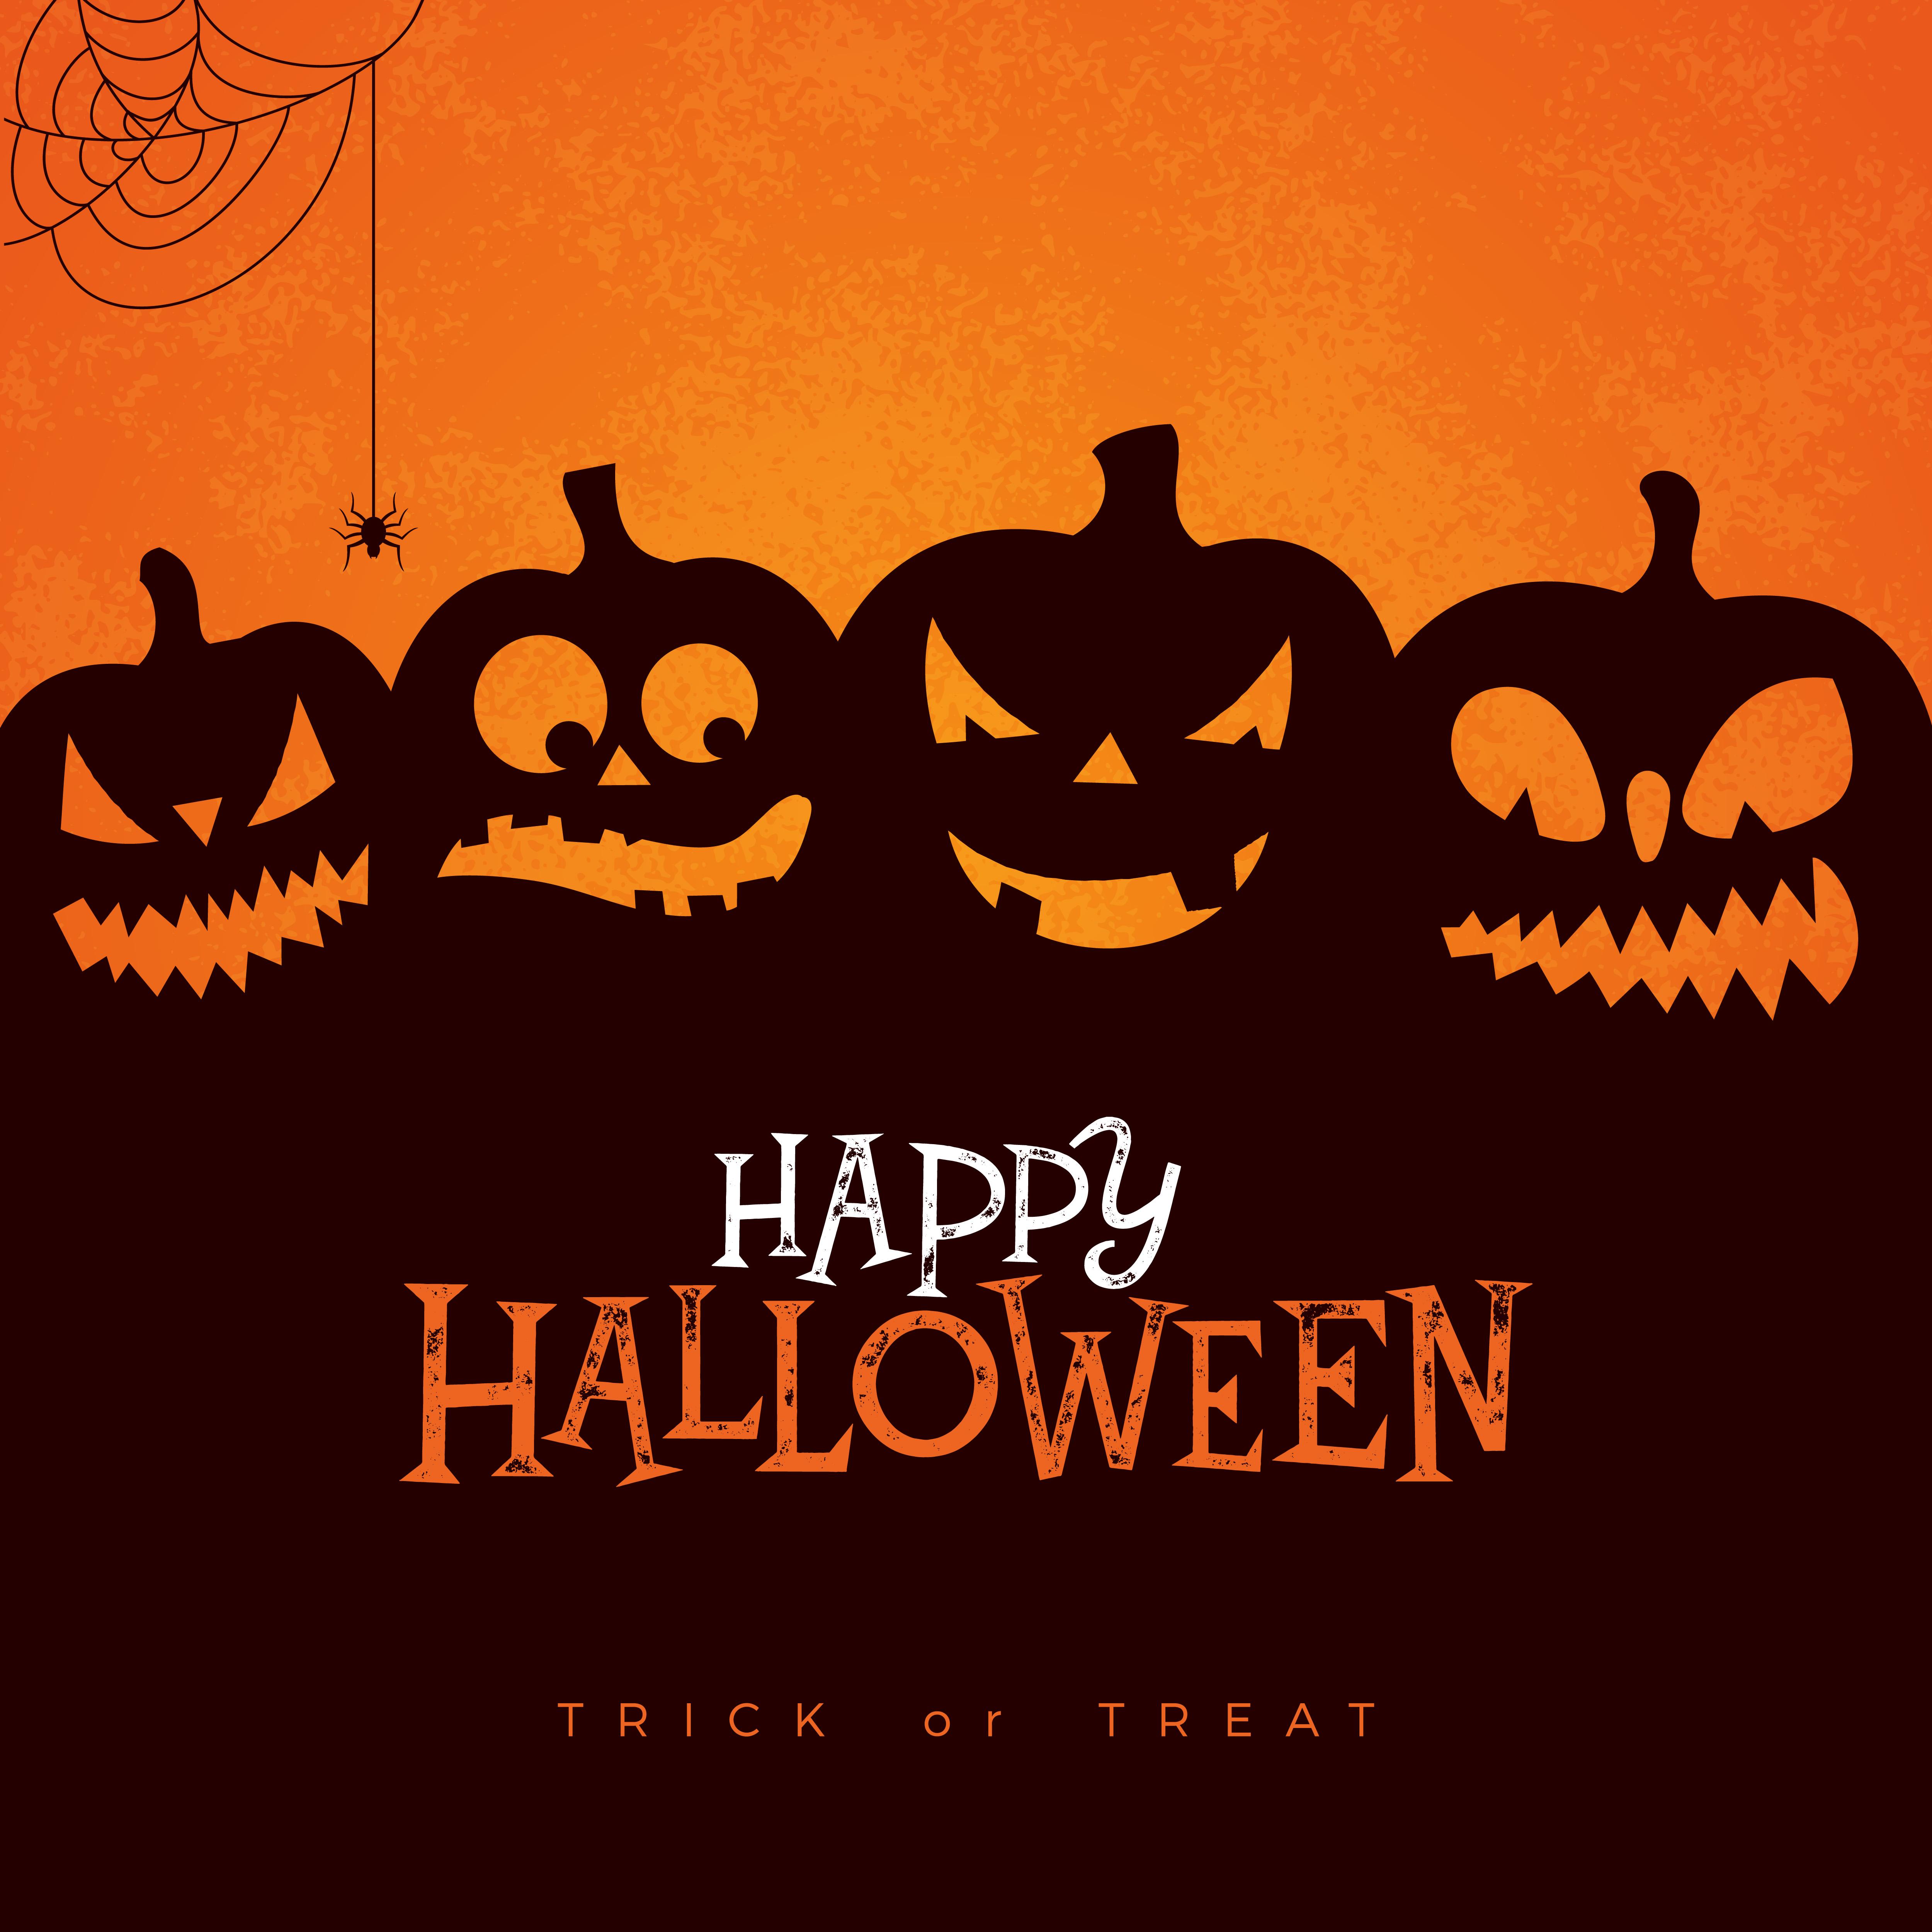 Happy Halloween! — Mitchells Journey